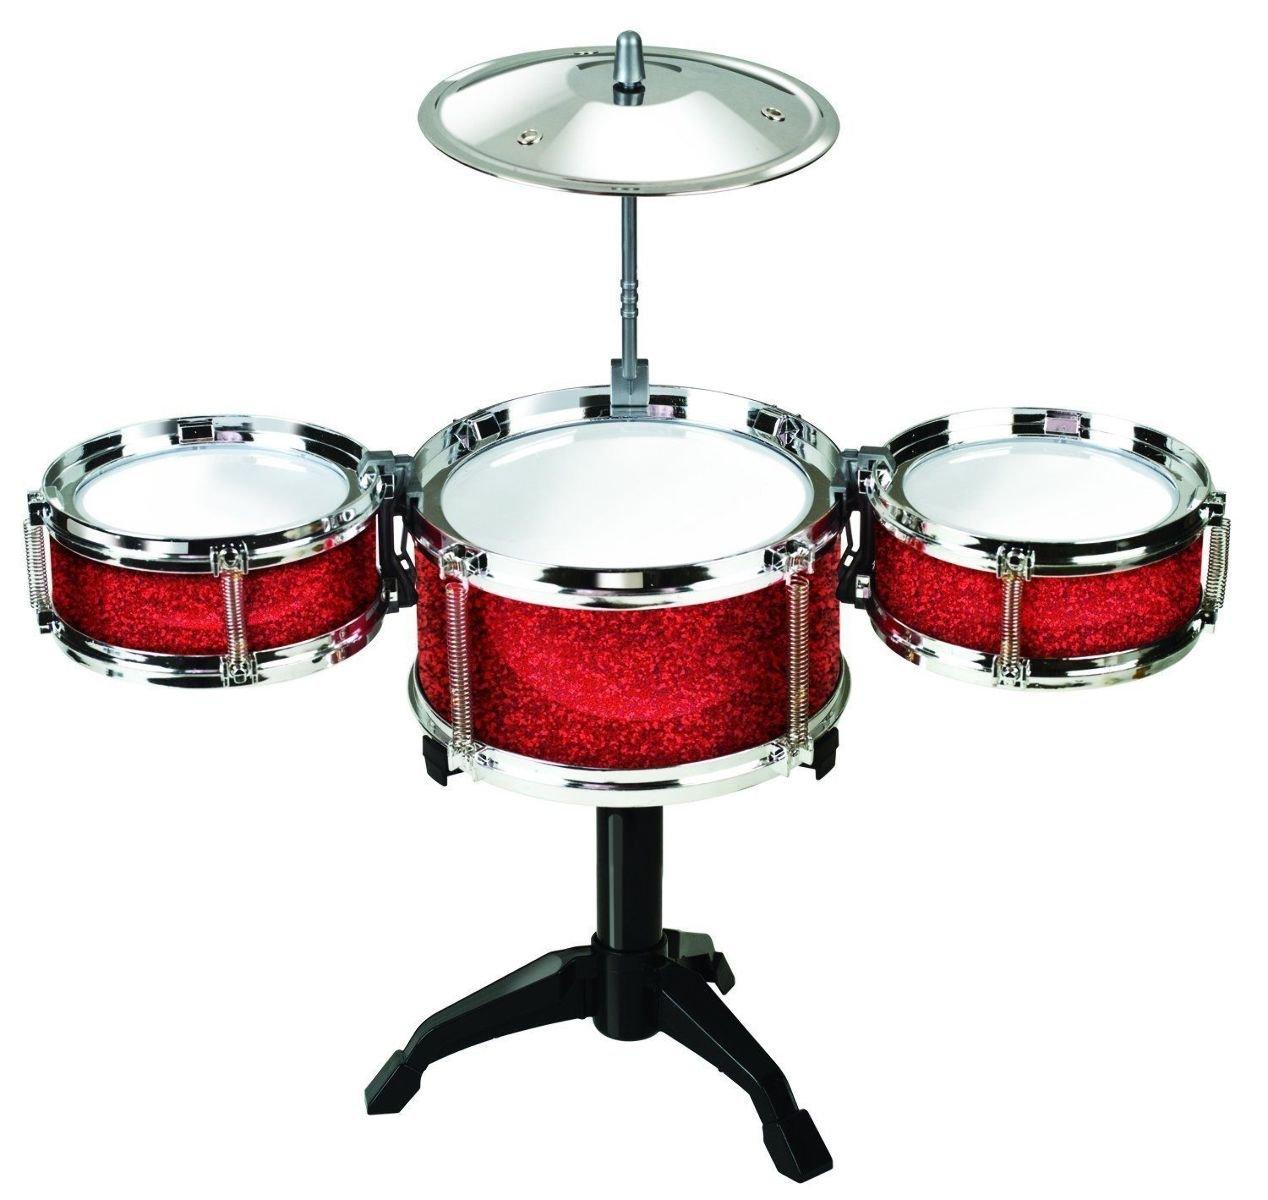 Amazon.com: Desktop Drum Set - Red: Toys & Games